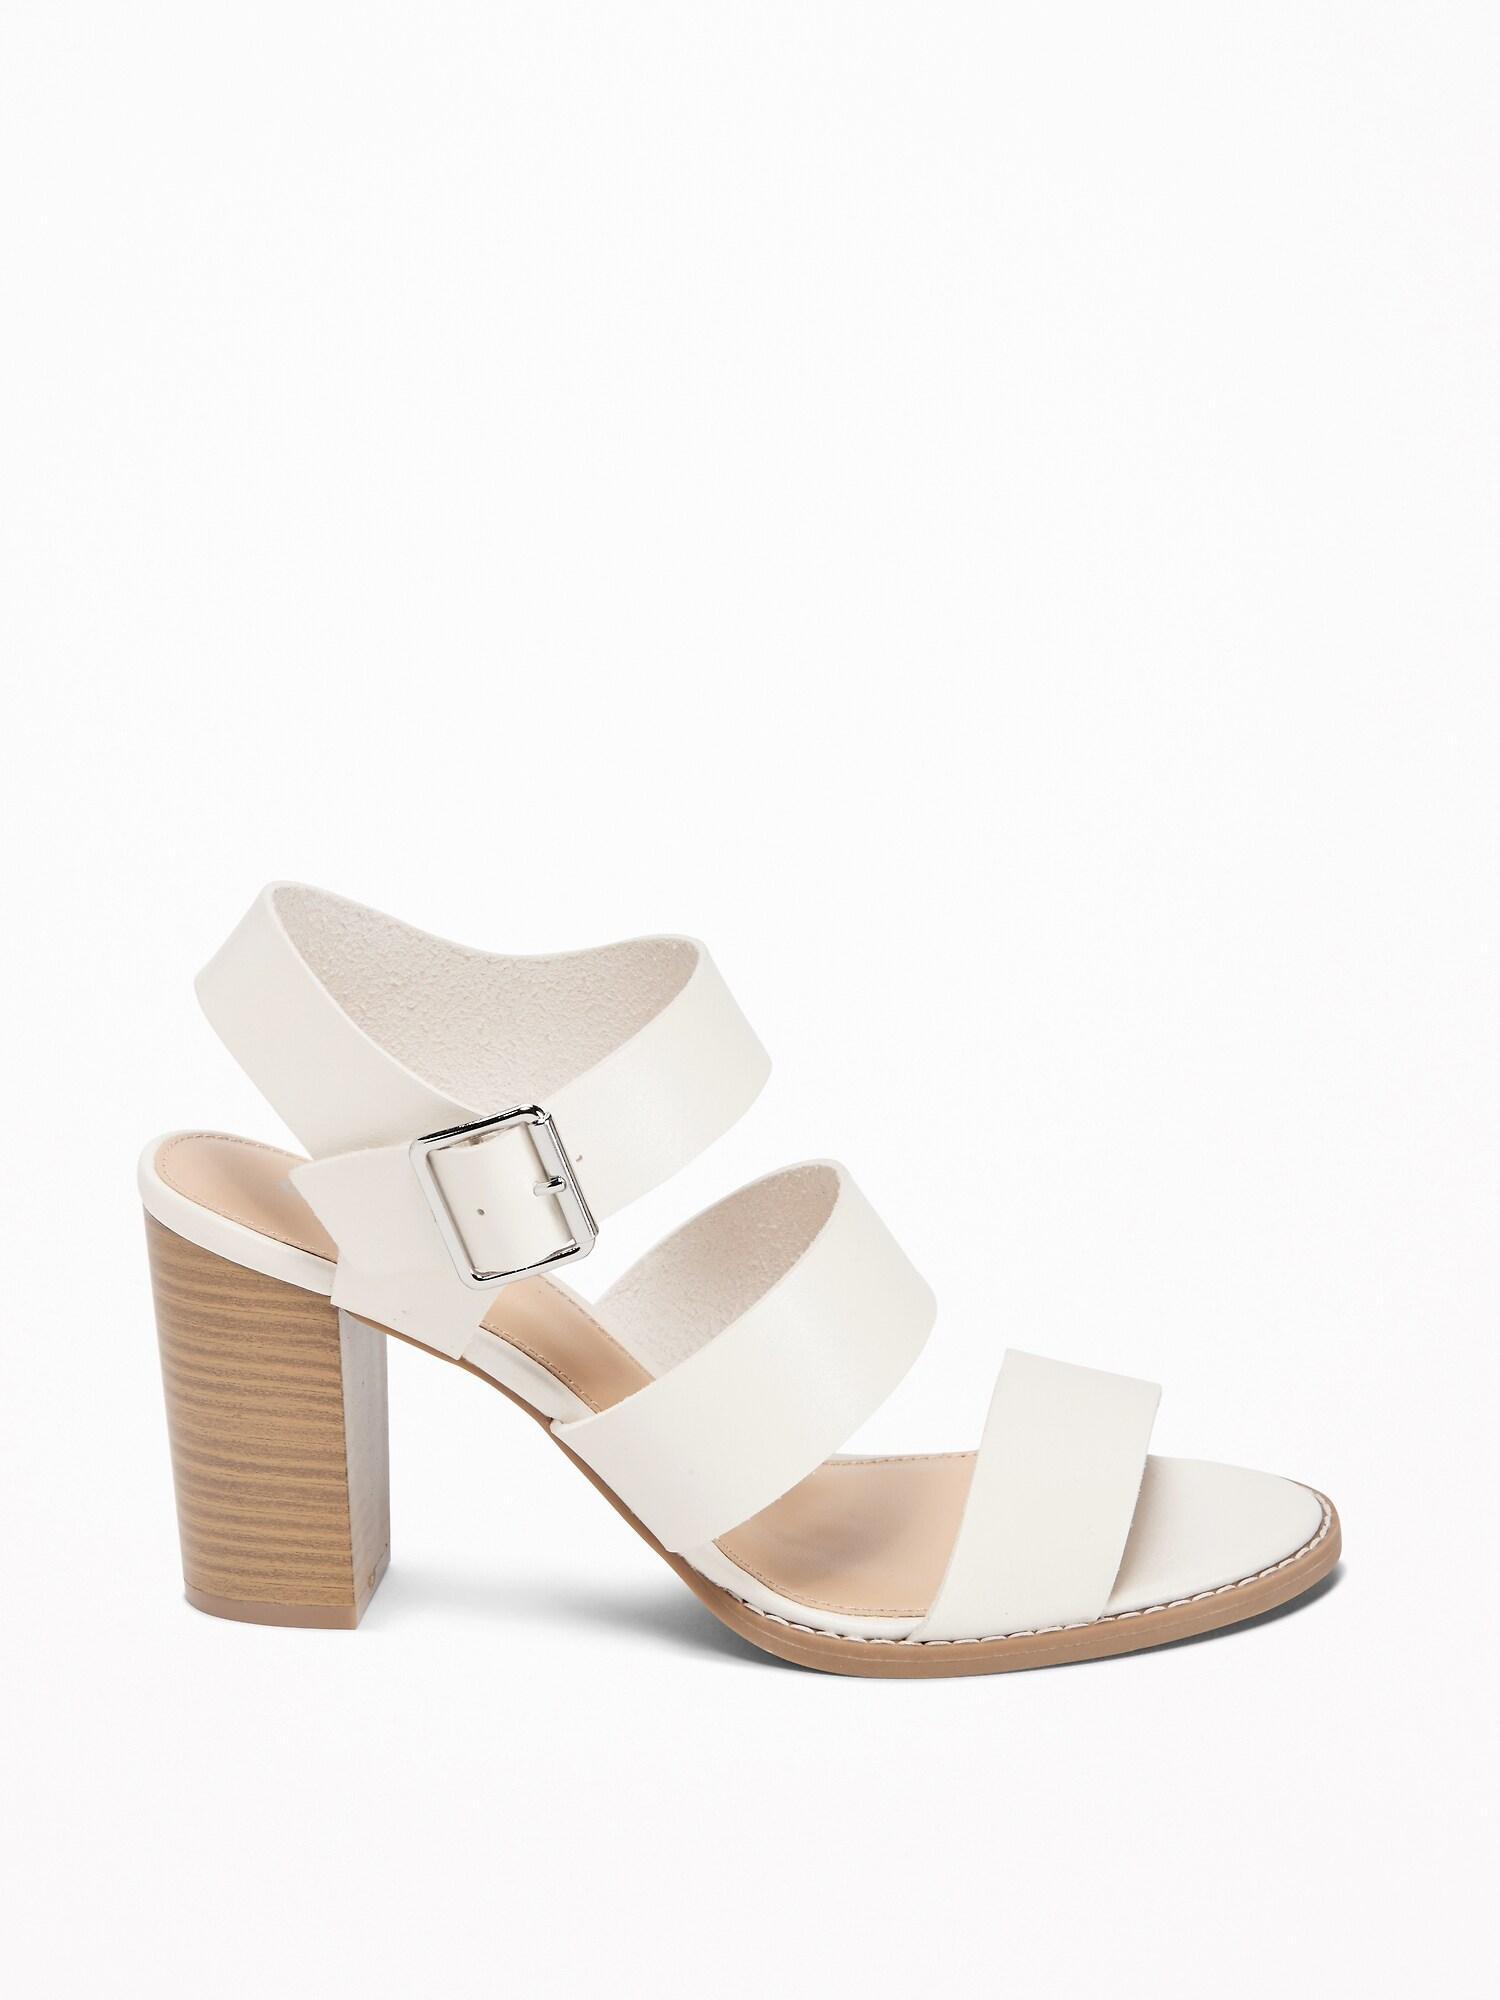 b5f74de8d317a Old Navy Three-strap Block-heel Sandals in White - Lyst